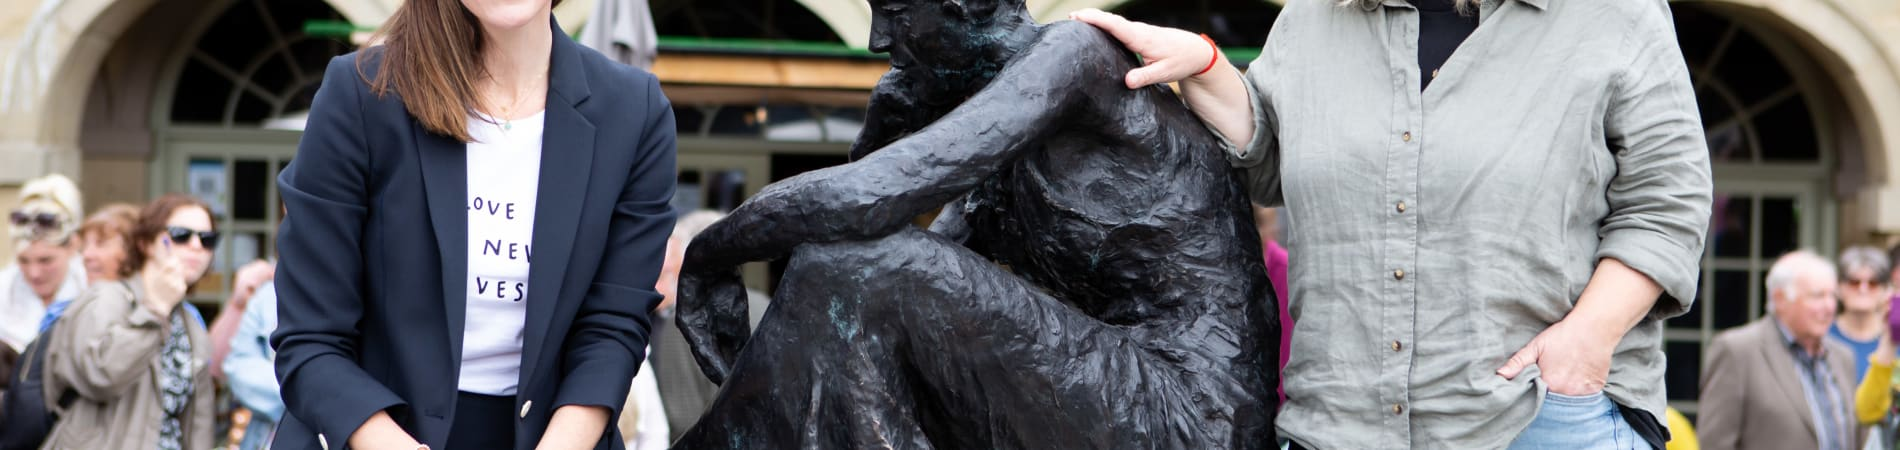 Marshalls donation to iconic local 'Gentleman Jack' sculpture